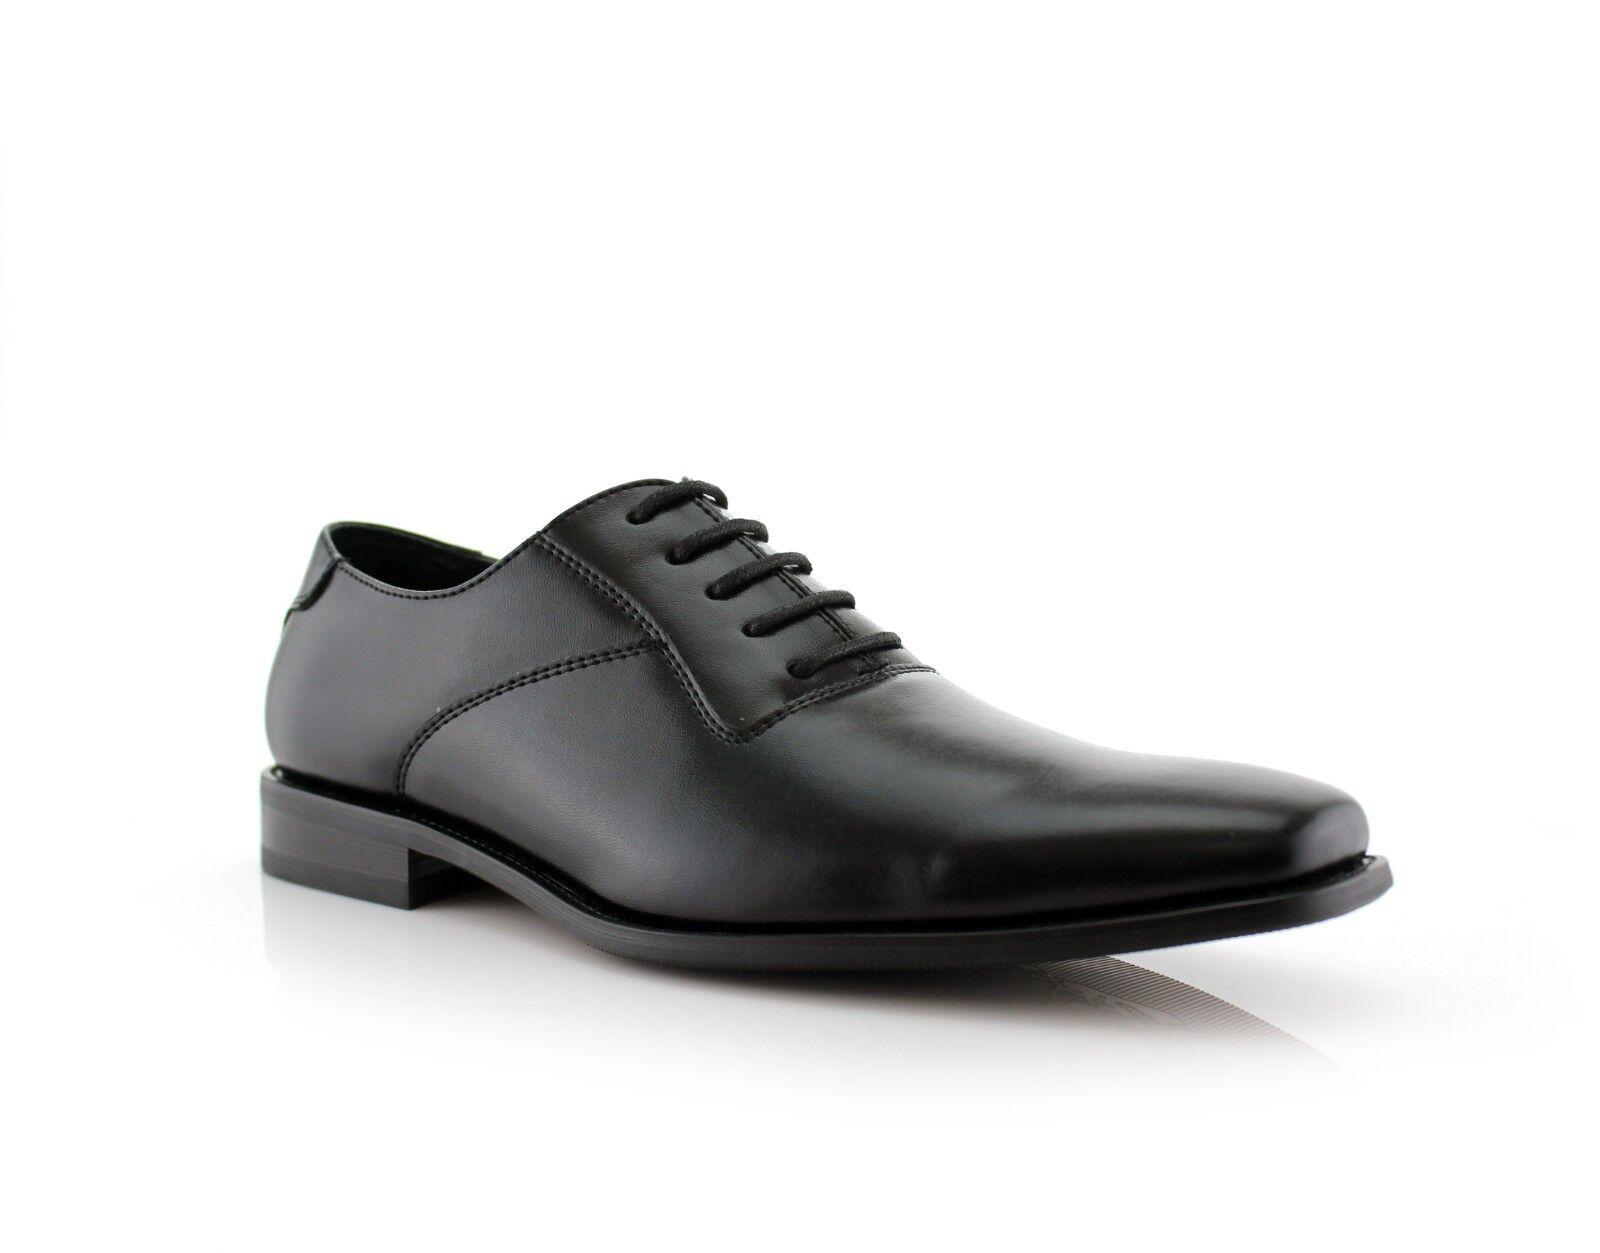 Ferro Aldo Jeremiah MFA19277  Men's Wing Tip Leather Lining Oxford Dress shoes